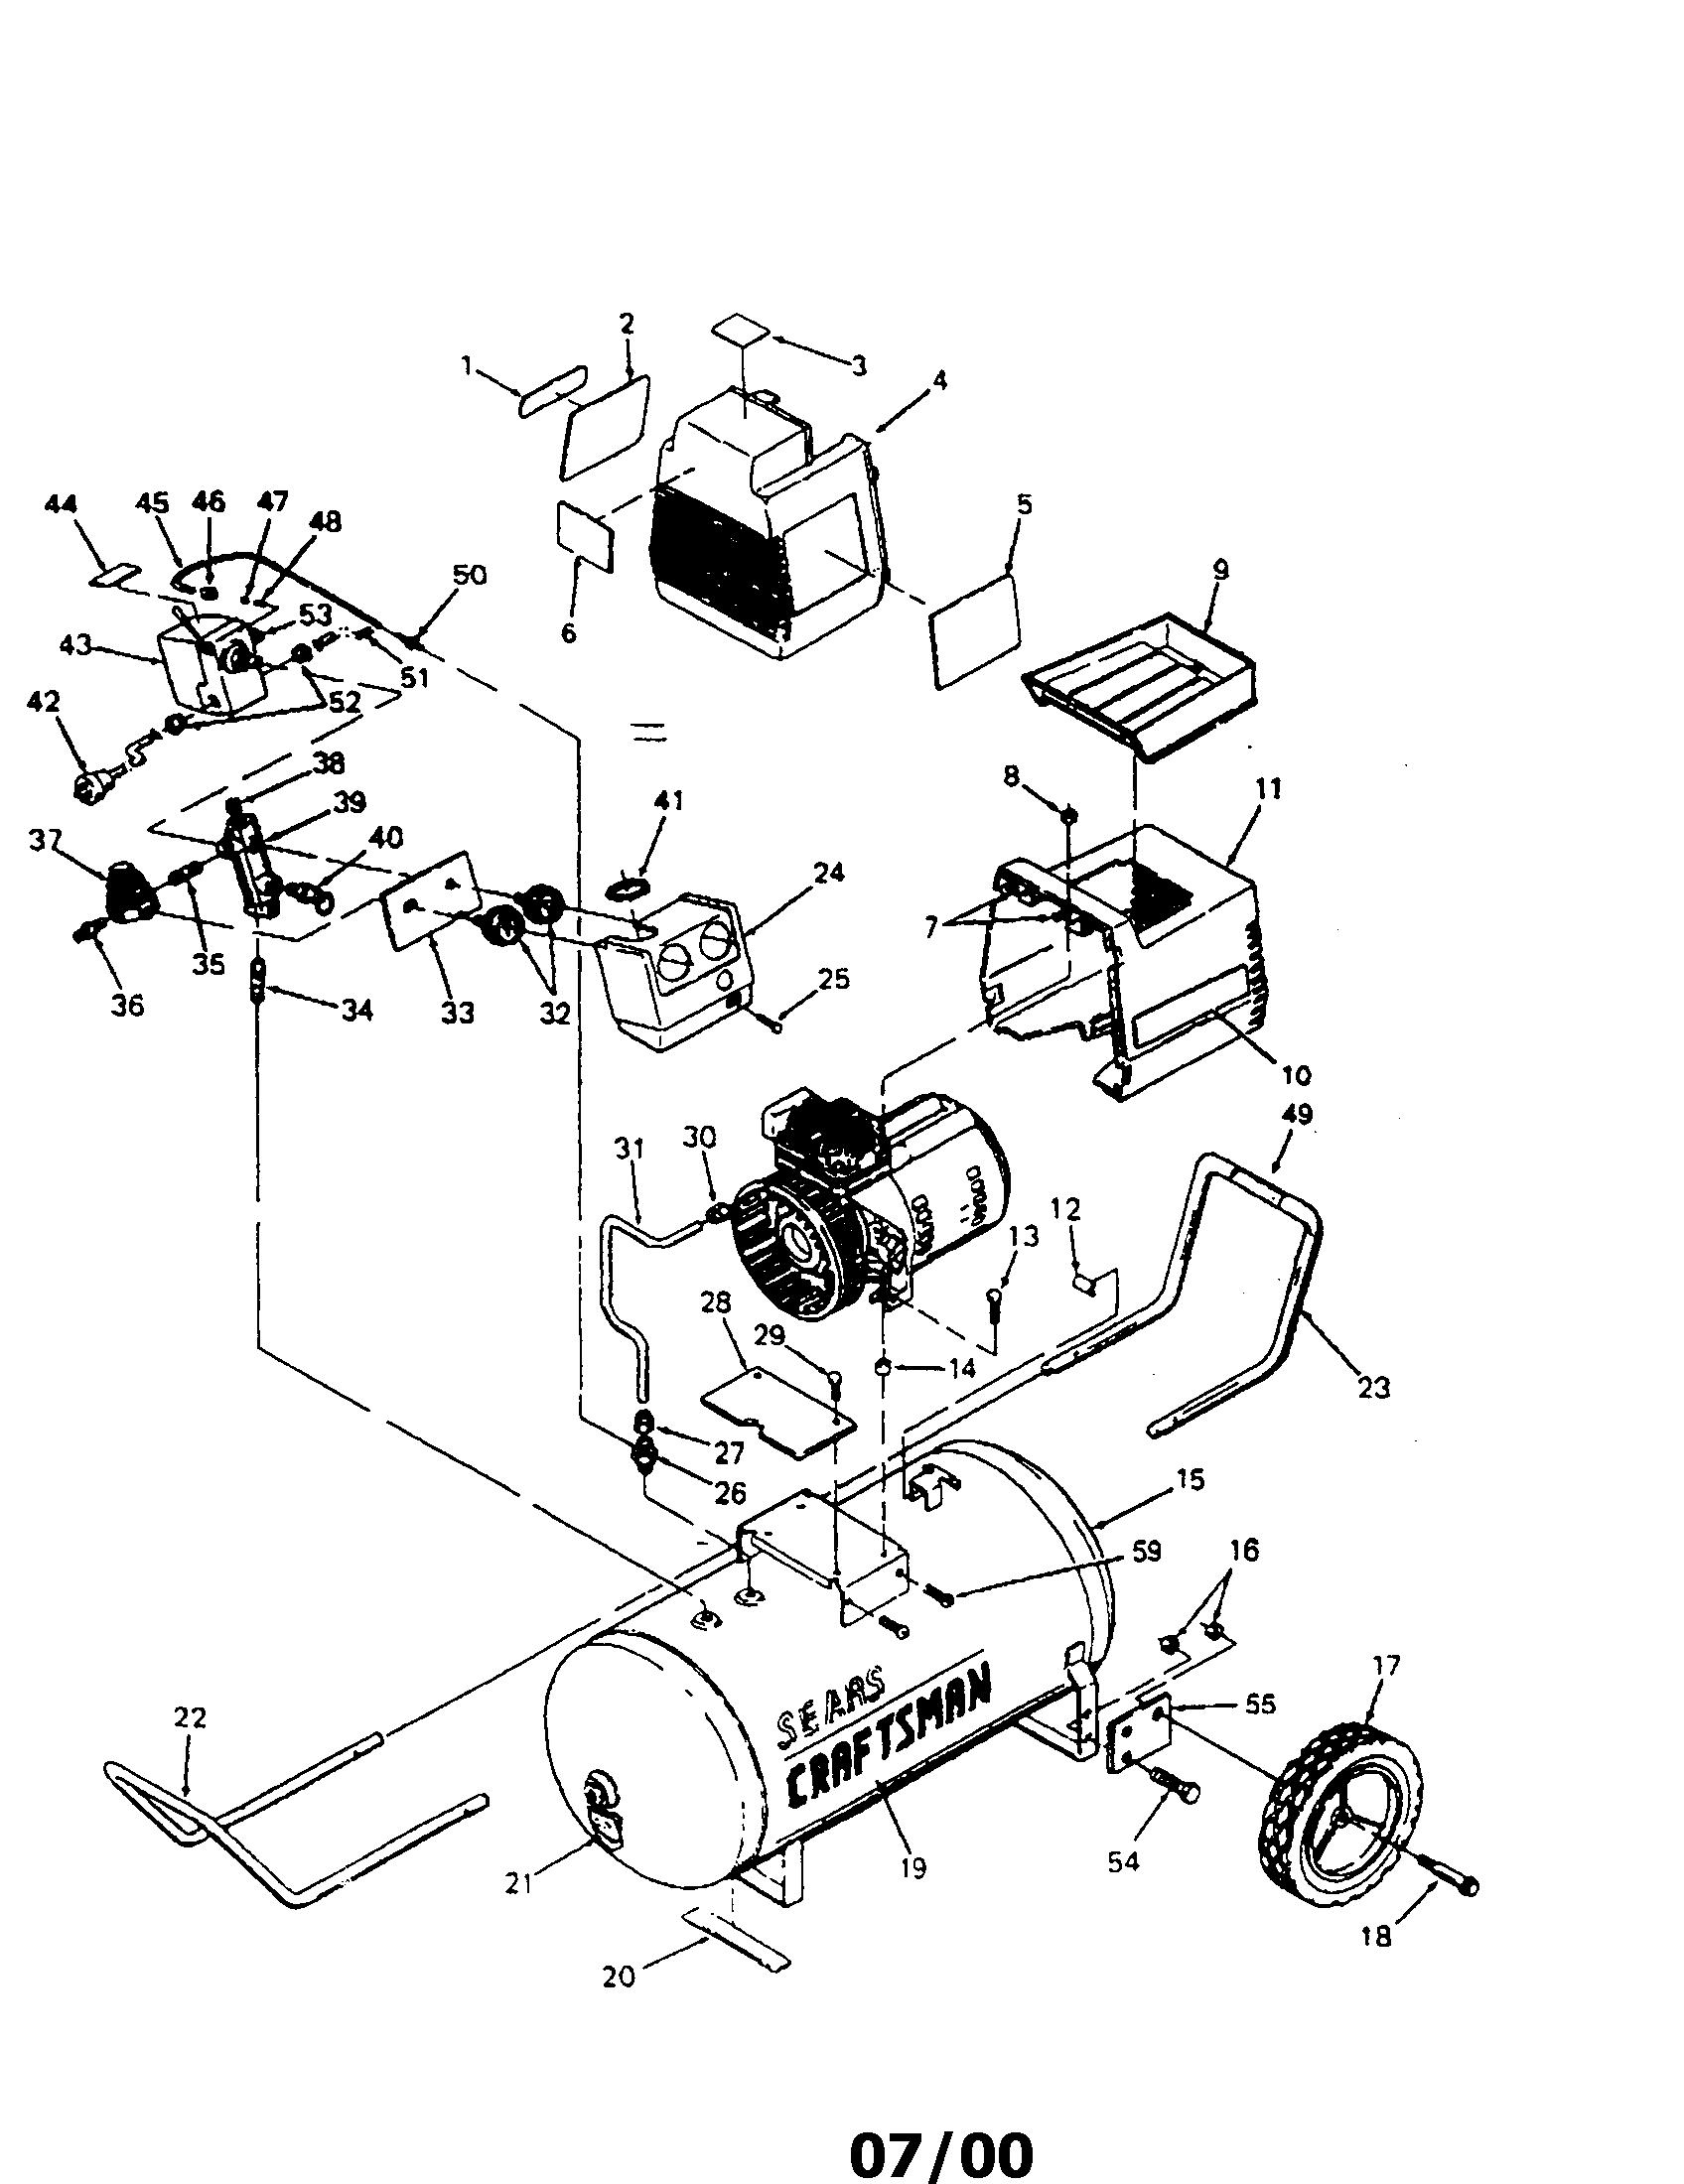 [DIAGRAM_38IS]  GS_6507] Devilbiss Air Compressor Wiring Diagram Free Diagram | Devilbiss Air Compressor Wiring Diagram |  | Exxlu Puti Mohammedshrine Librar Wiring 101